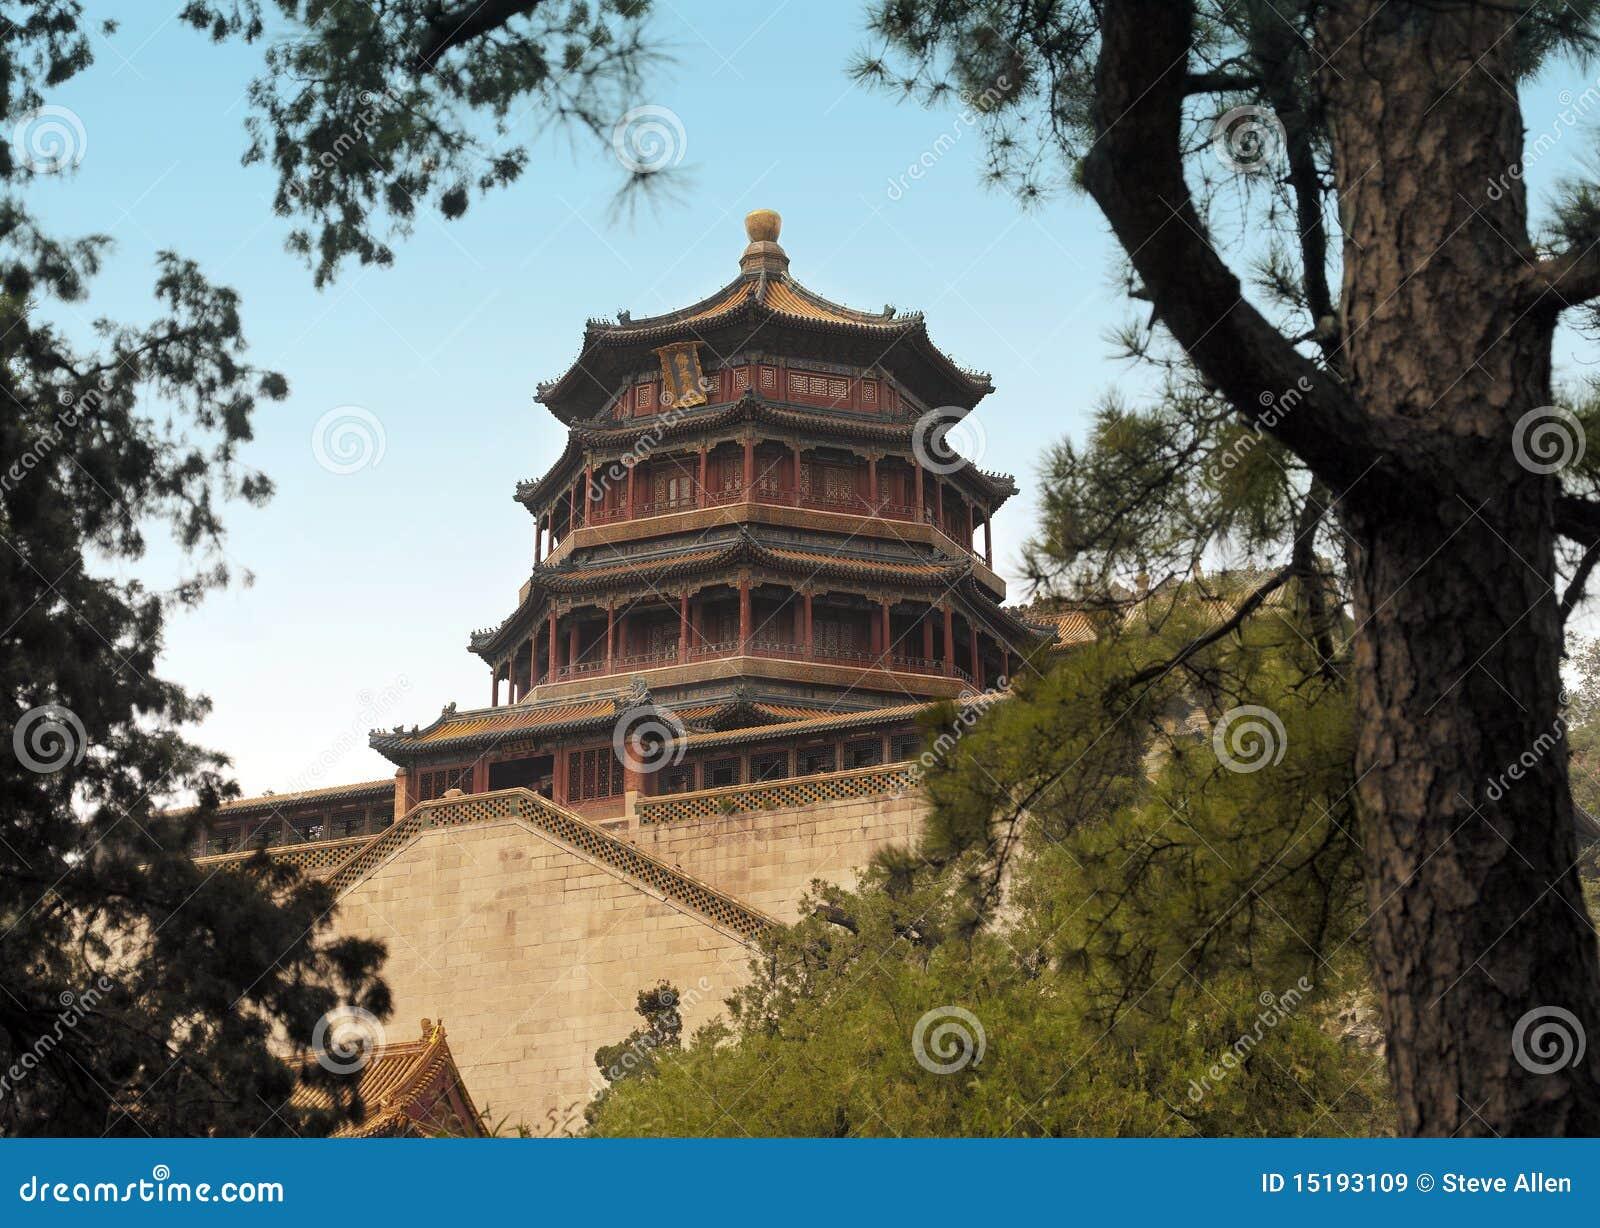 Der Sommer-Palast in Peking - China